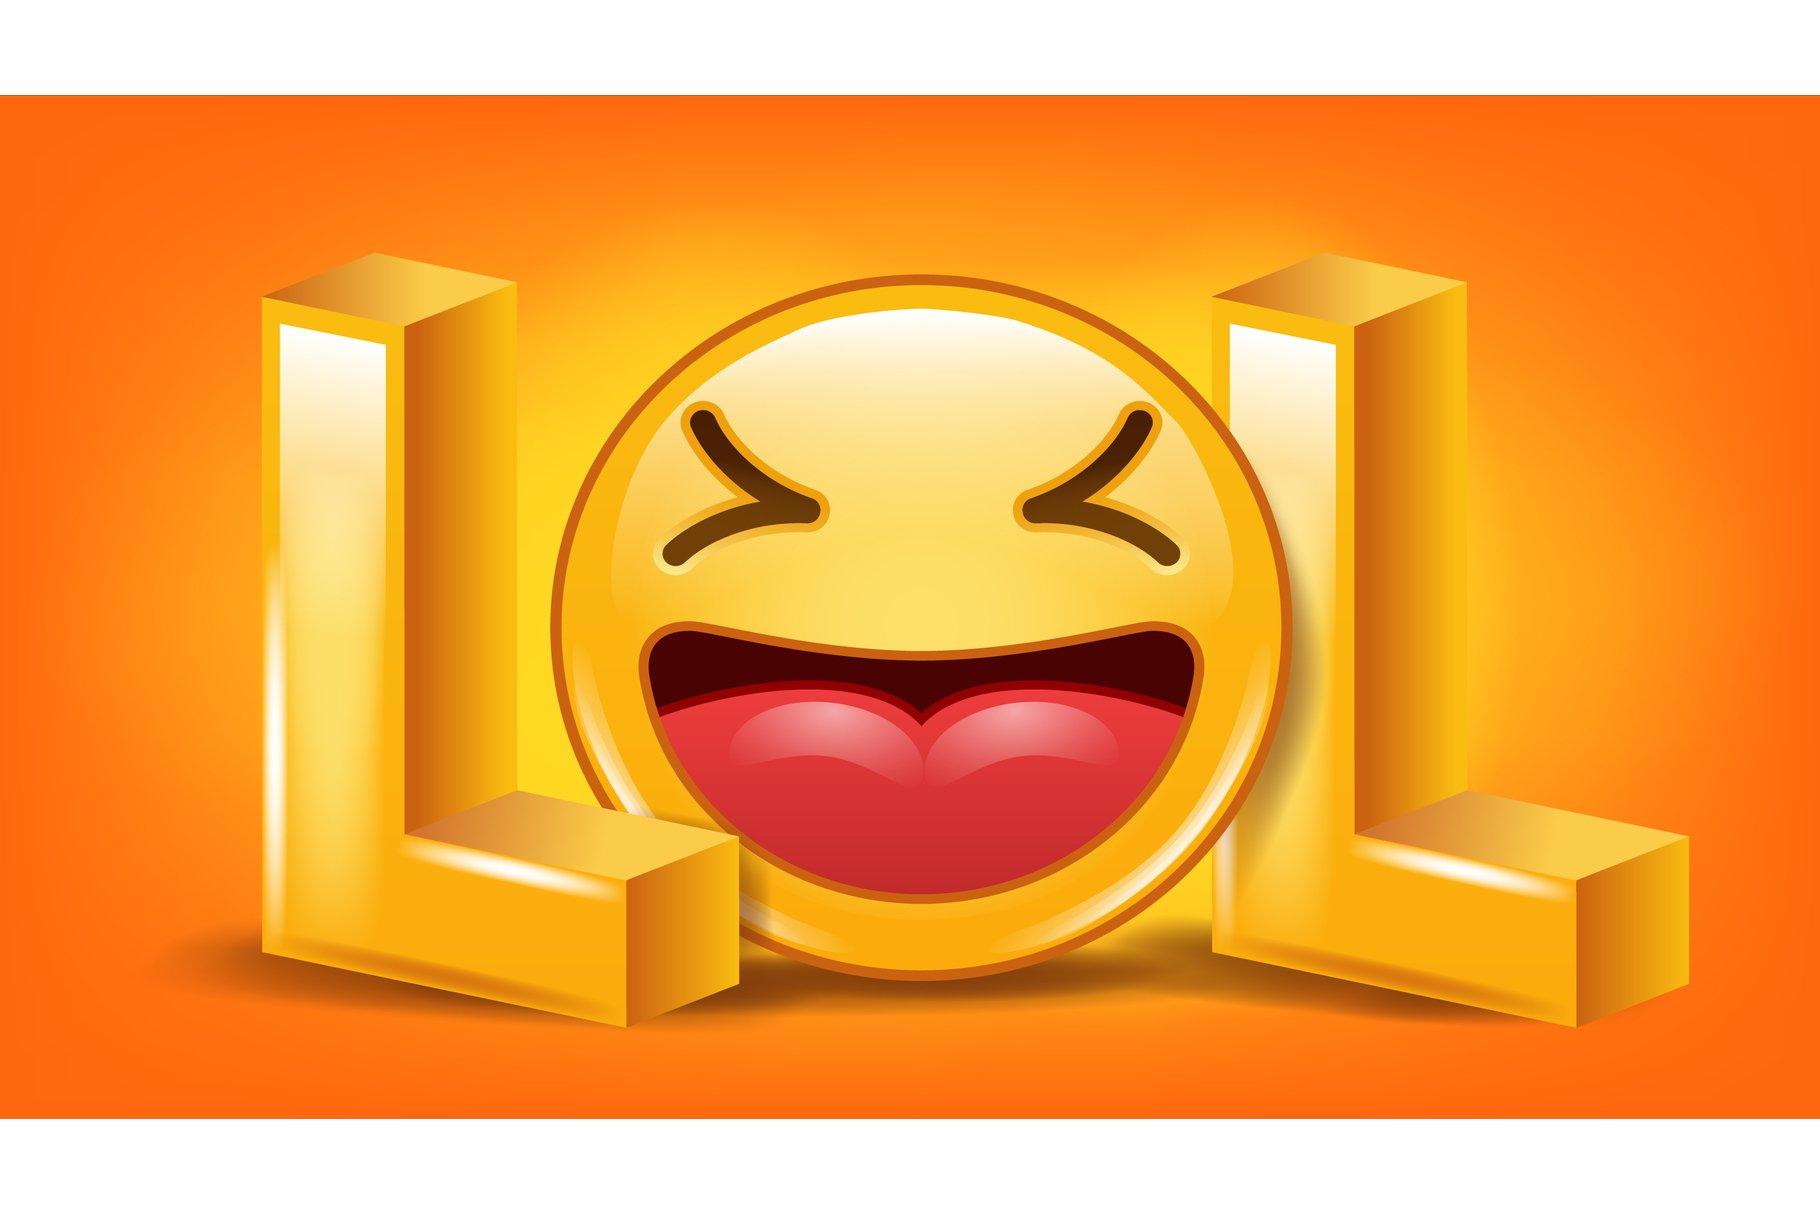 Lol Sign Vector. Fun Symbol. Emotion Smile. Facial example image 1